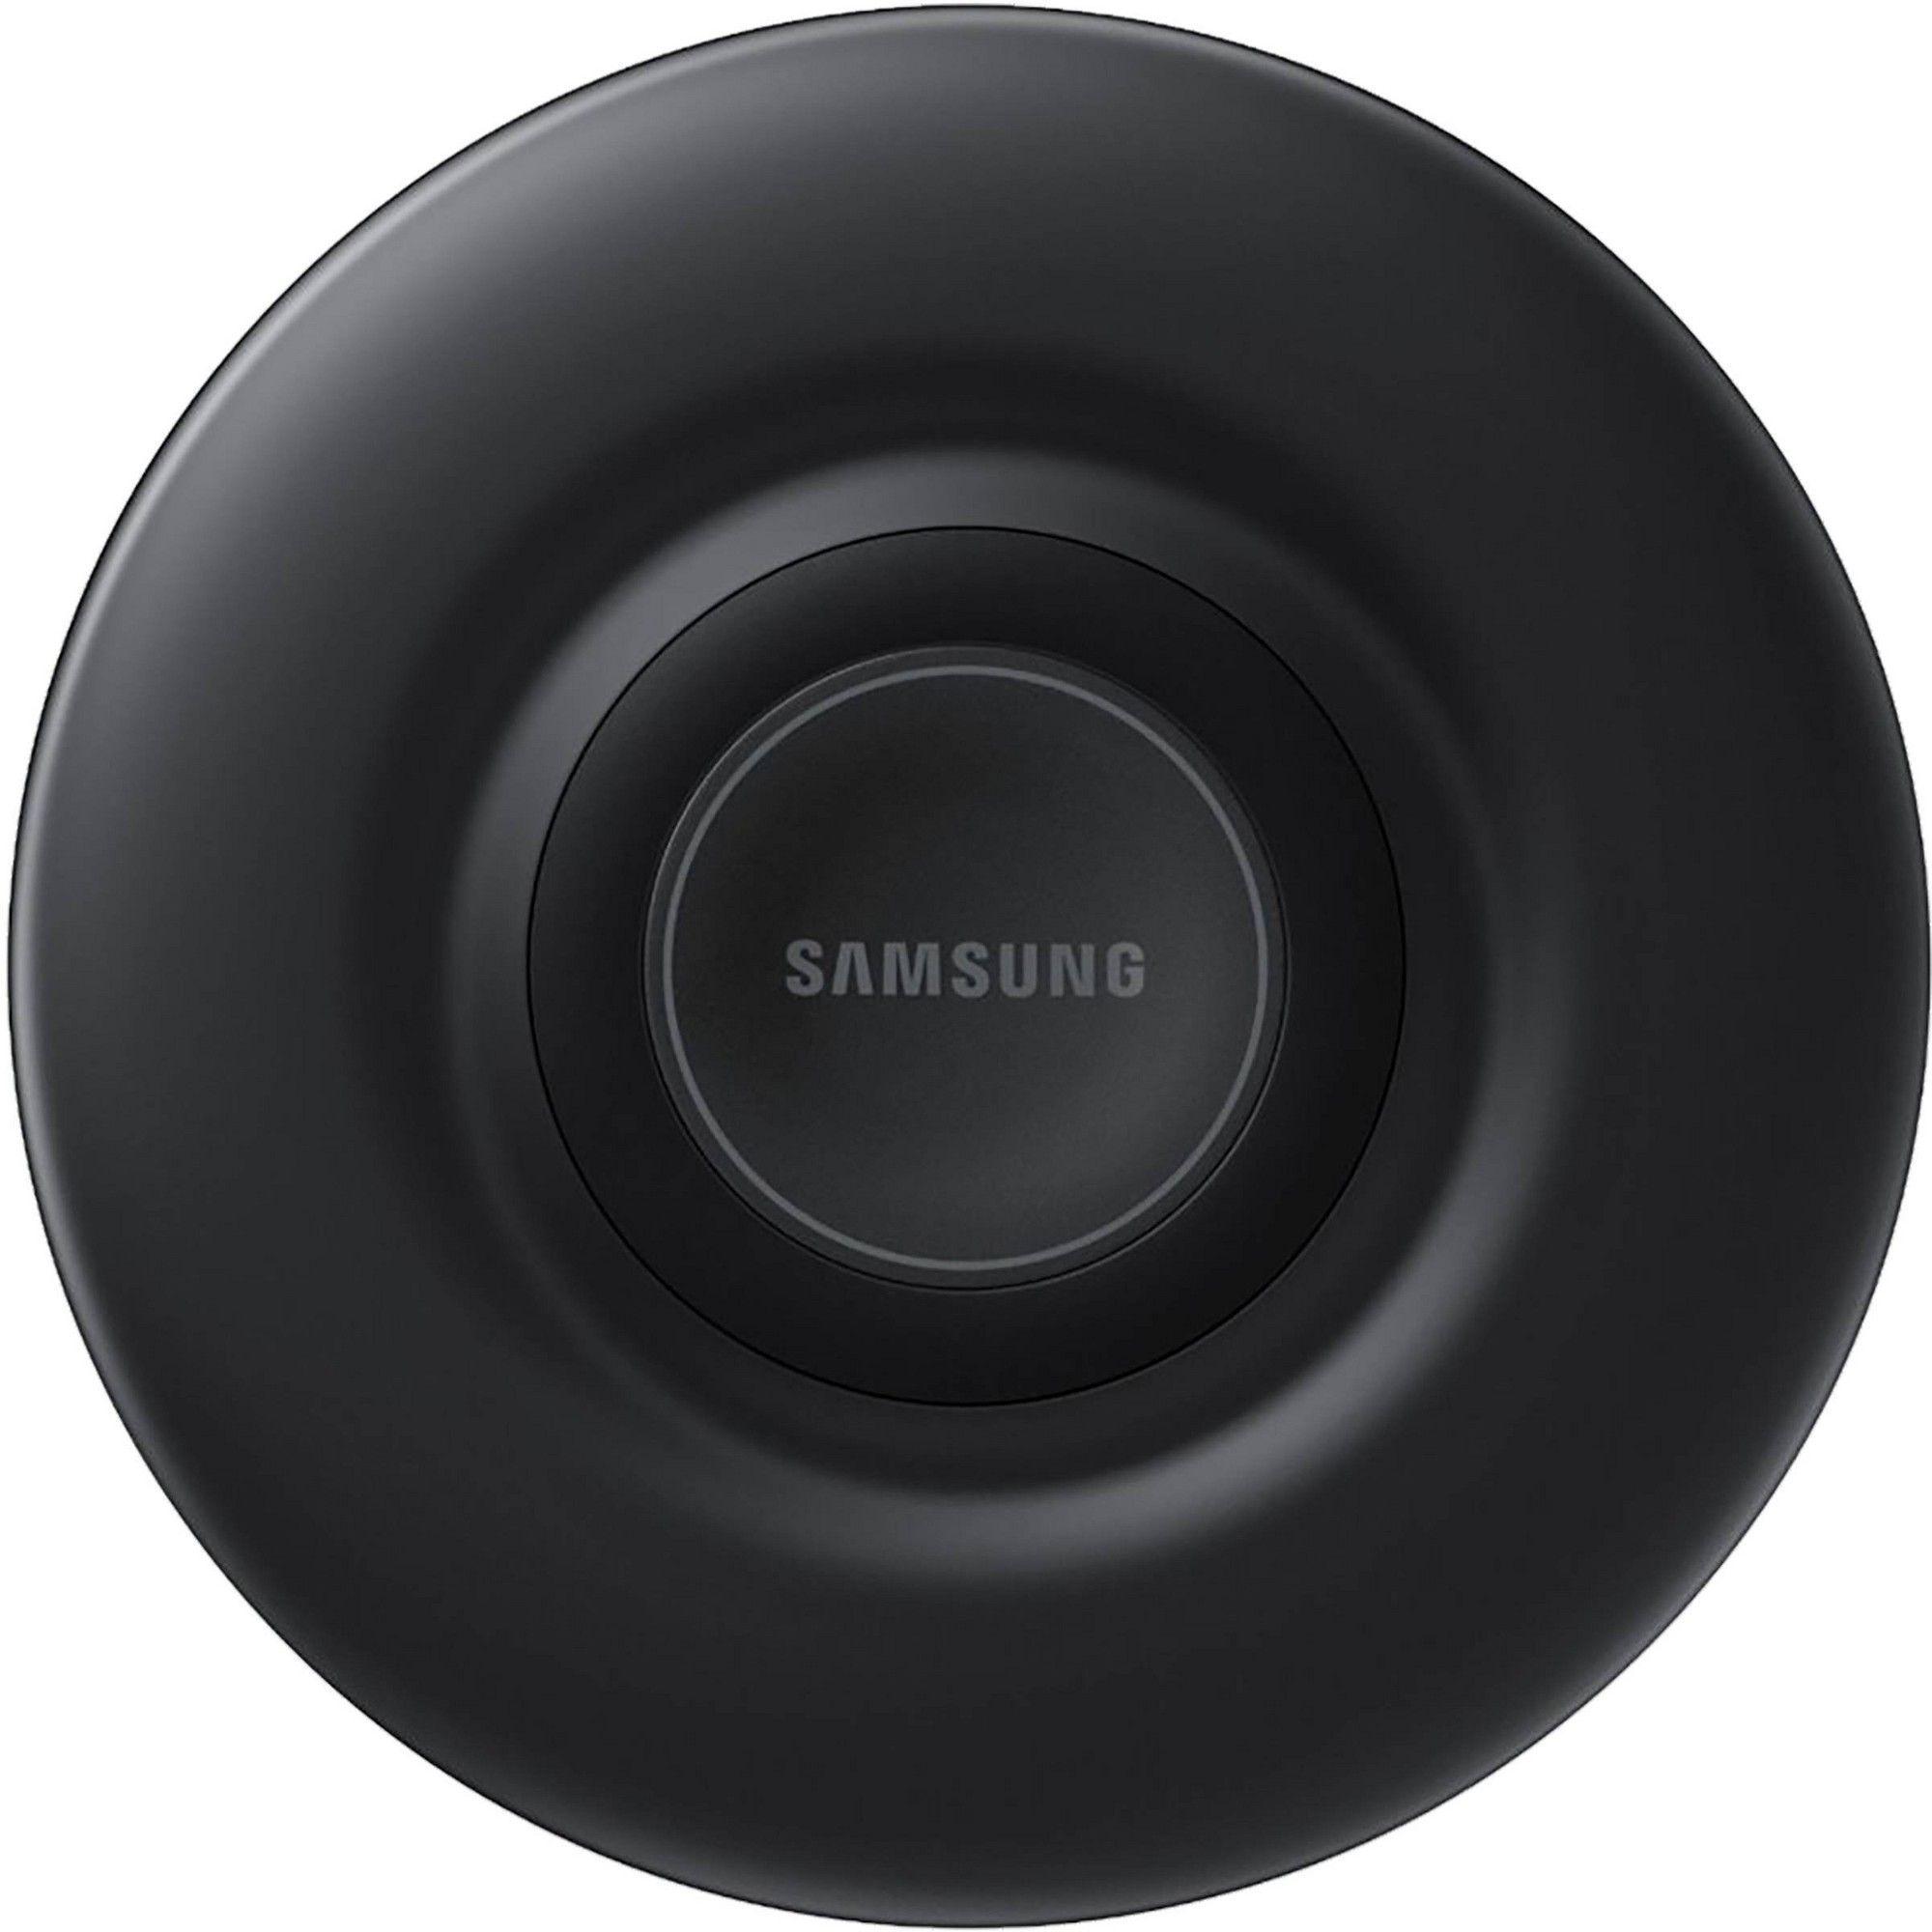 Samsung Wireless Qi Charging Pad Black in 2020